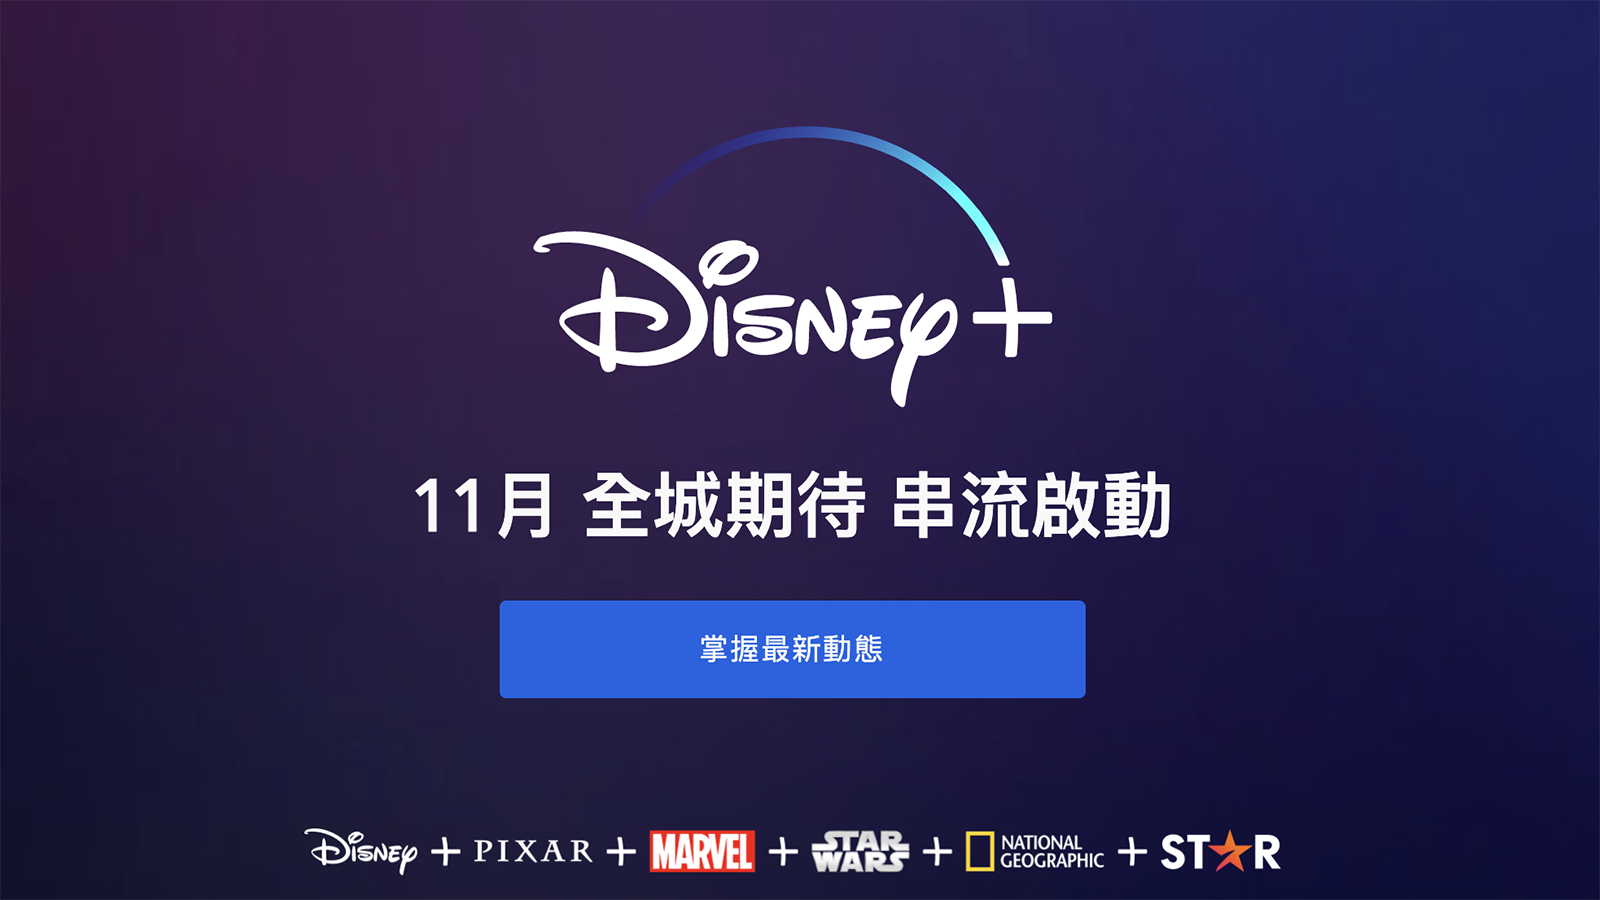 Disney+ hk tw Nov